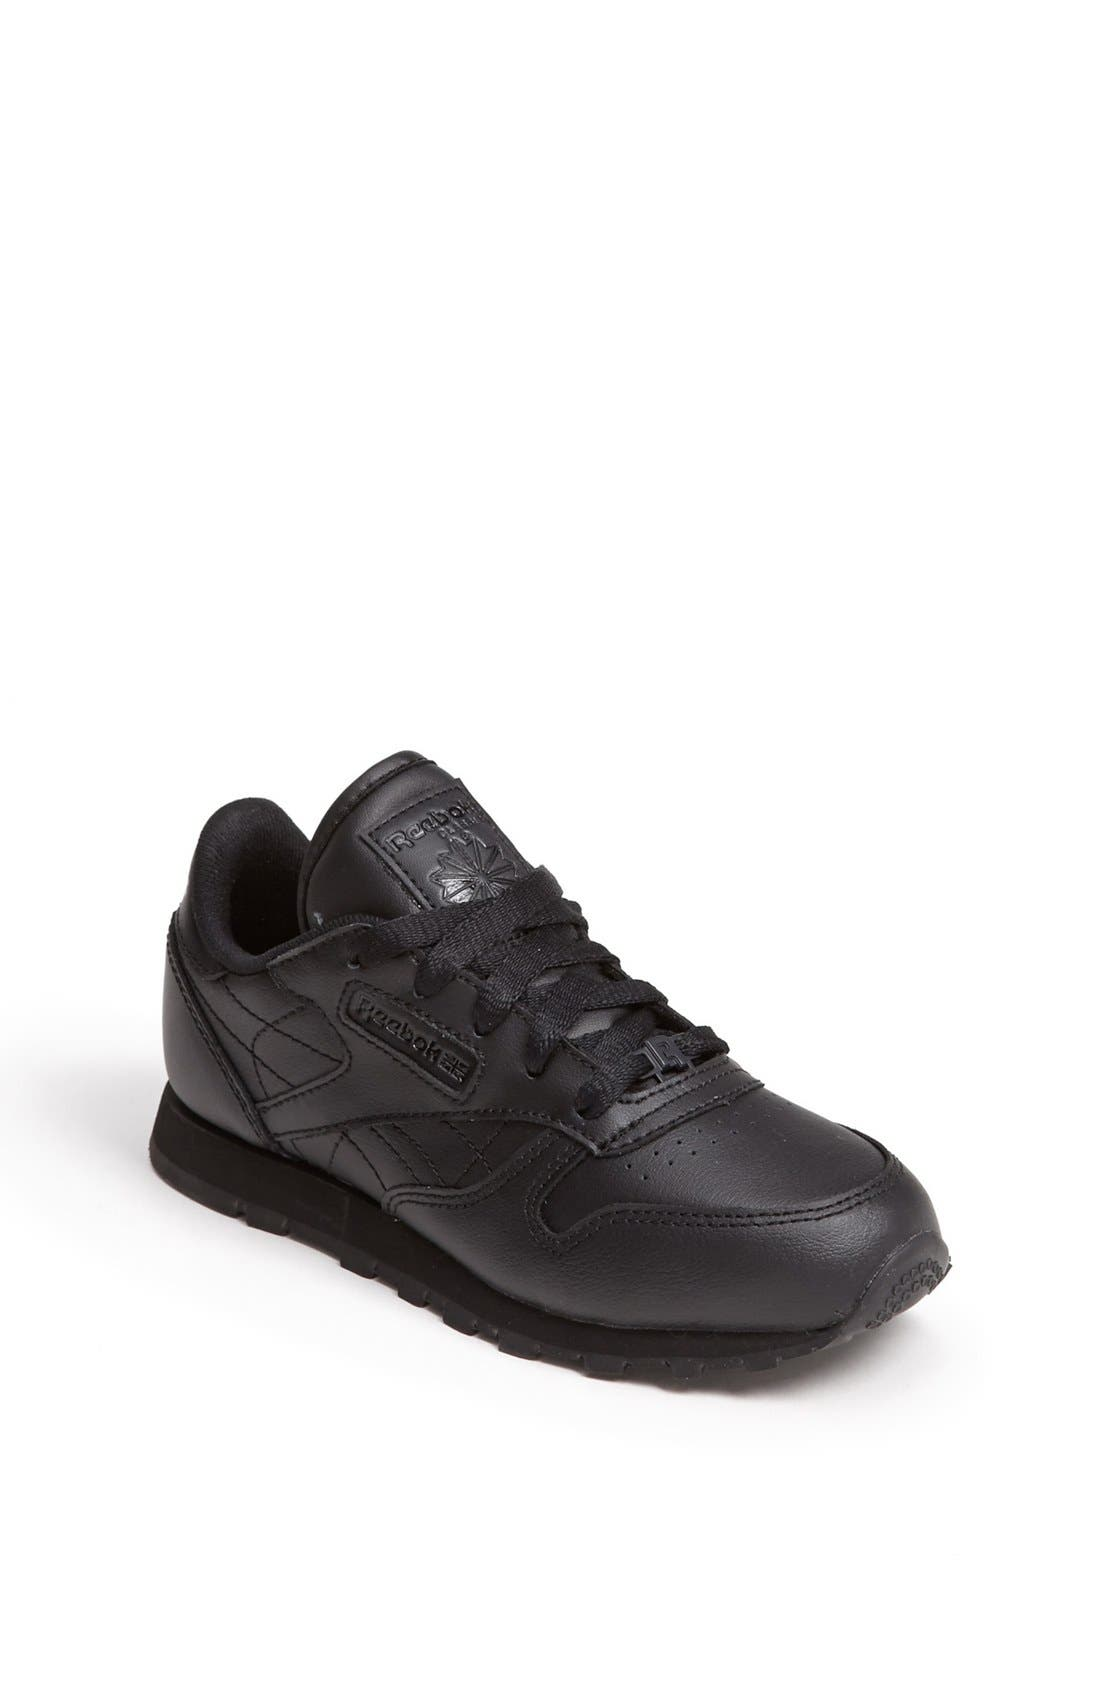 Alternate Image 1 Selected - Reebok 'Classic' Leather Sneaker (Toddler & Little Kid)